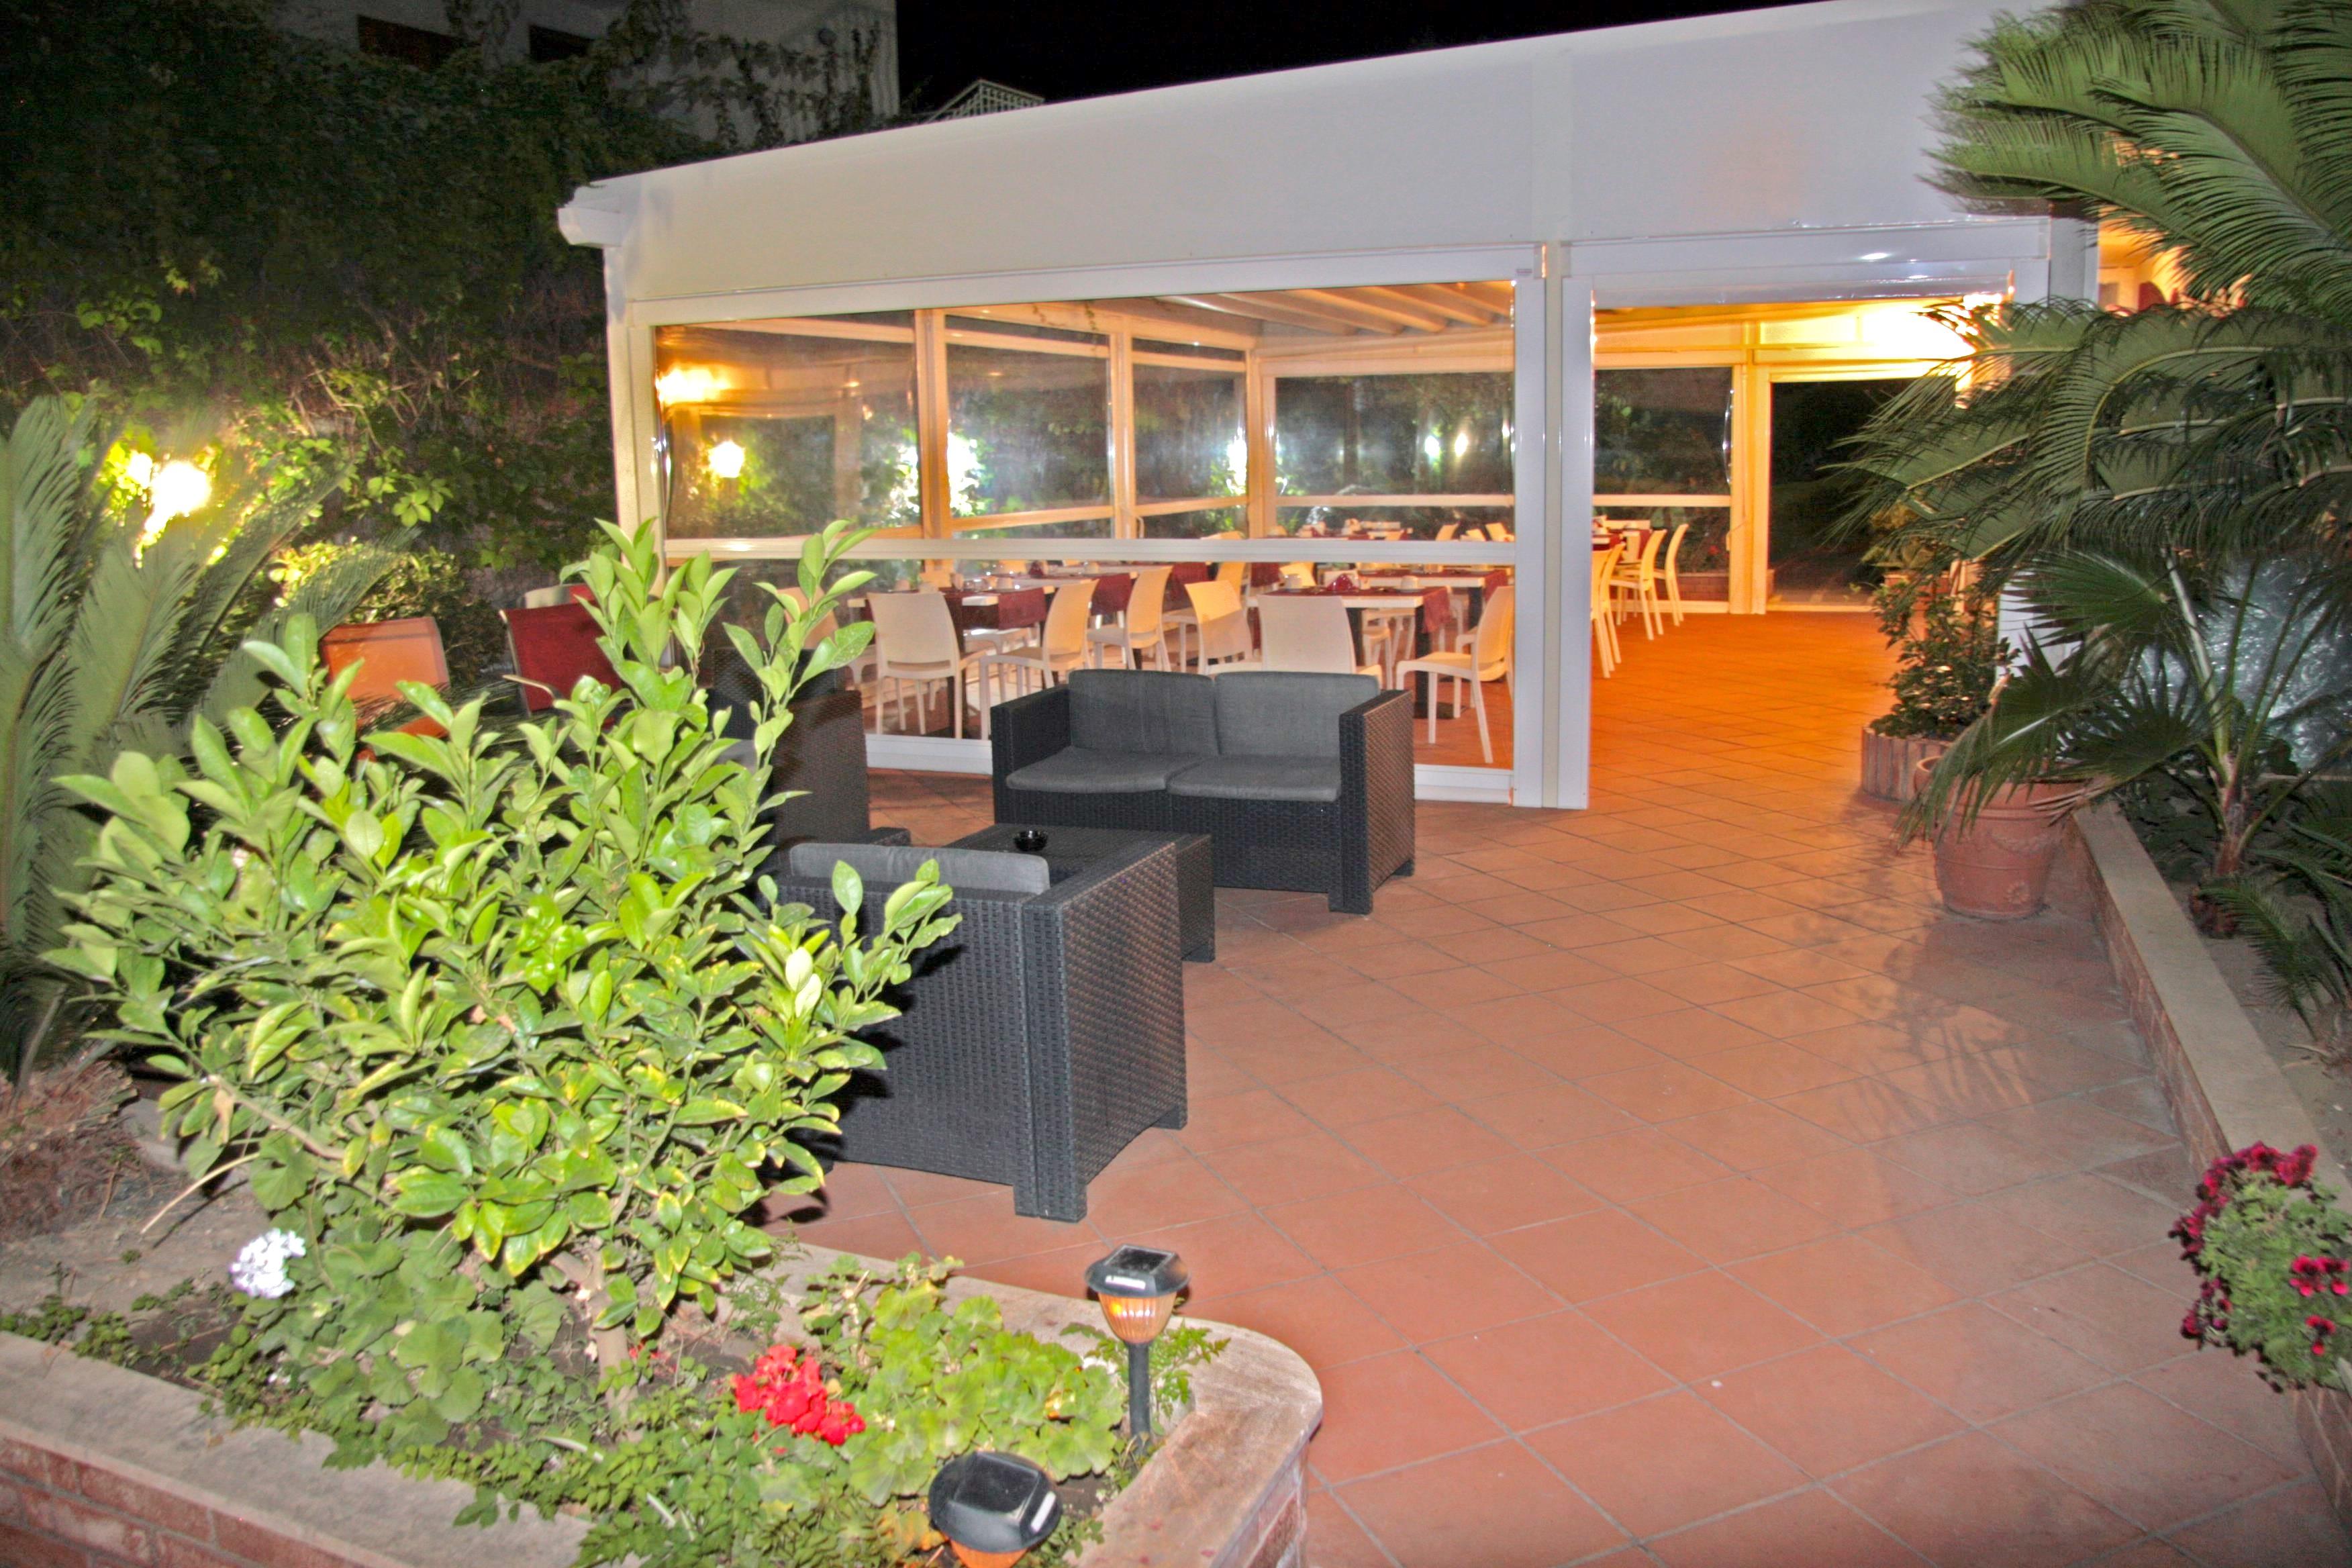 Hotel alexander ubytovanie giardini naxos sic lia taliansko solvex - Hotel alexander giardini naxos ...